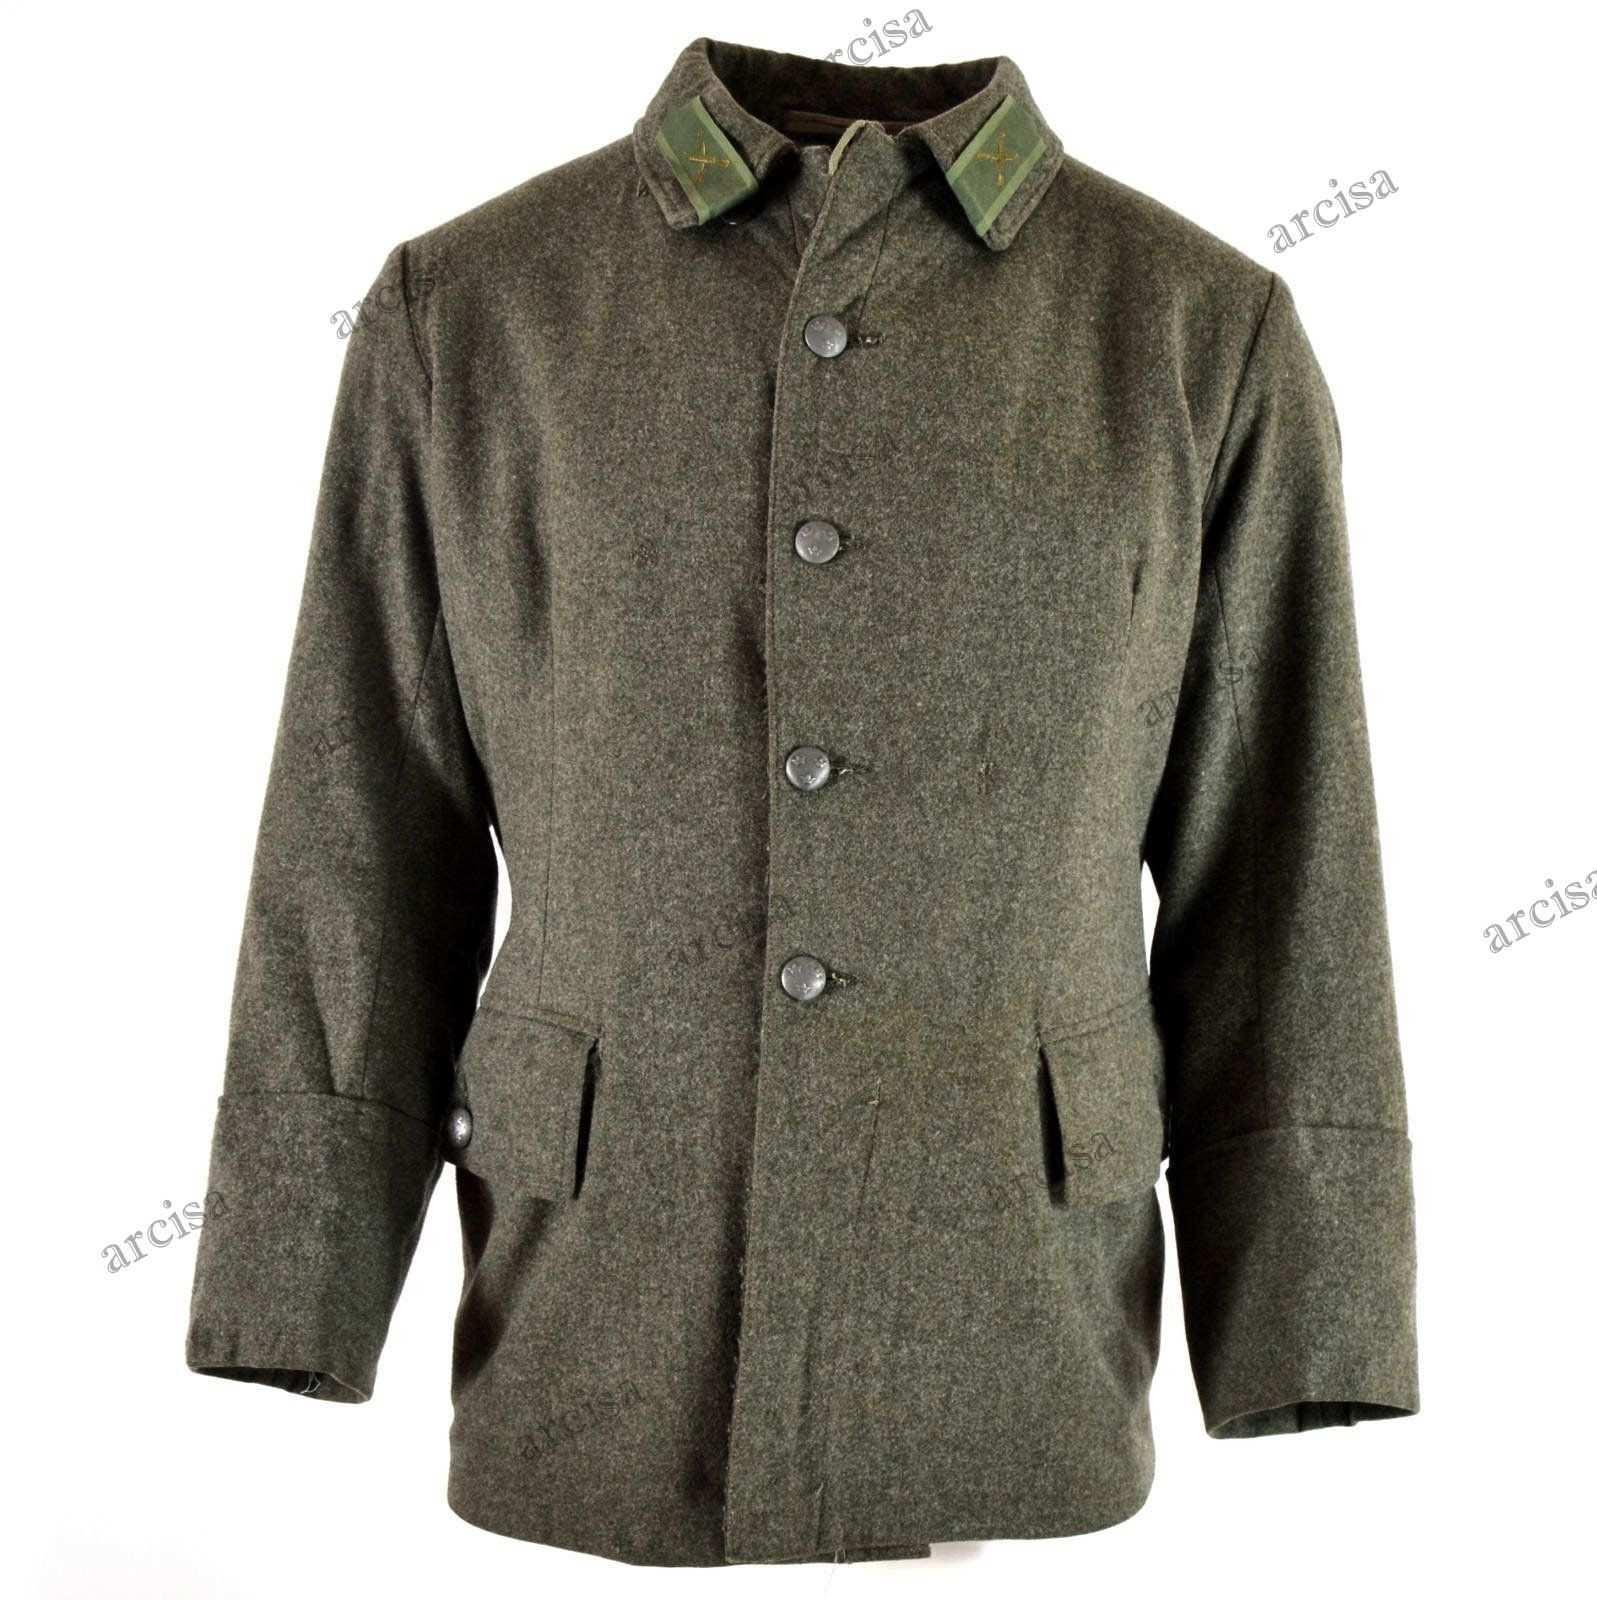 Wwii Original Vintage Swedish Army Wool Uniform Jacket M39 1940 039 S Uniform Swedish Army Jackets Uniform